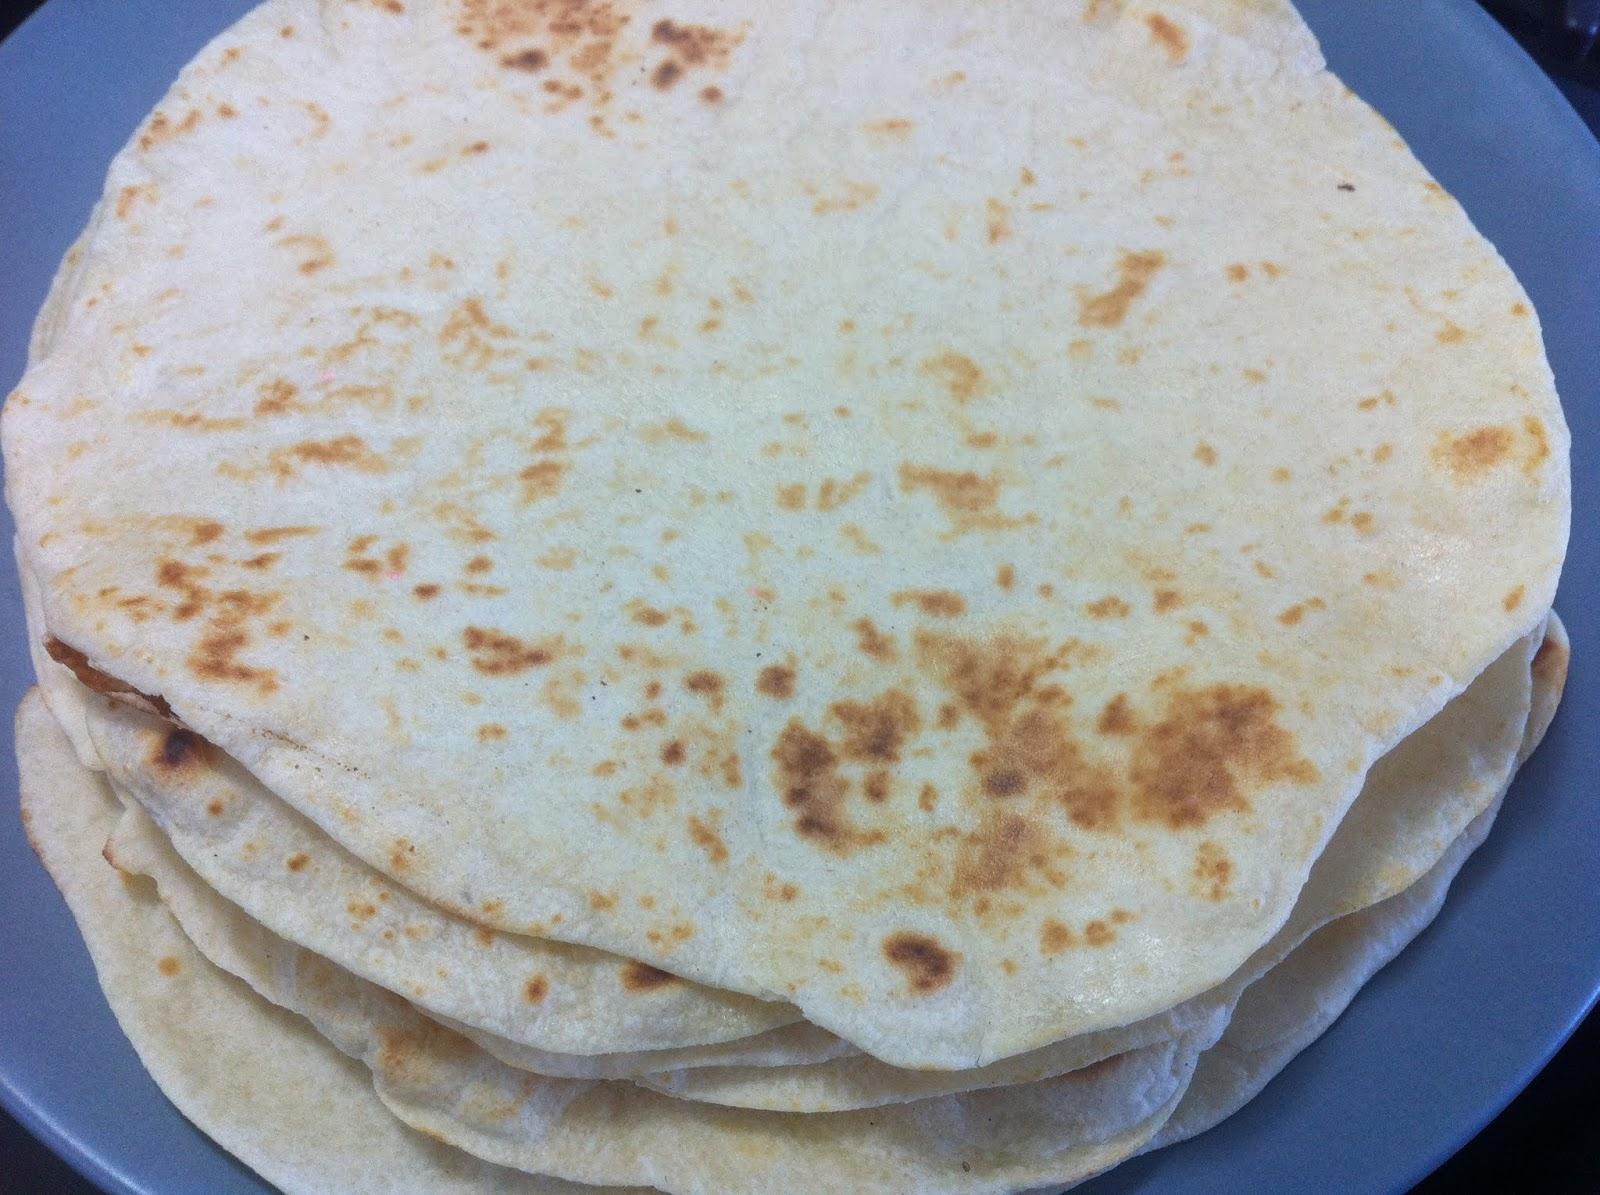 Cooking with SAHD: Homemade Flour Tortillas (No Lard or Shortening)